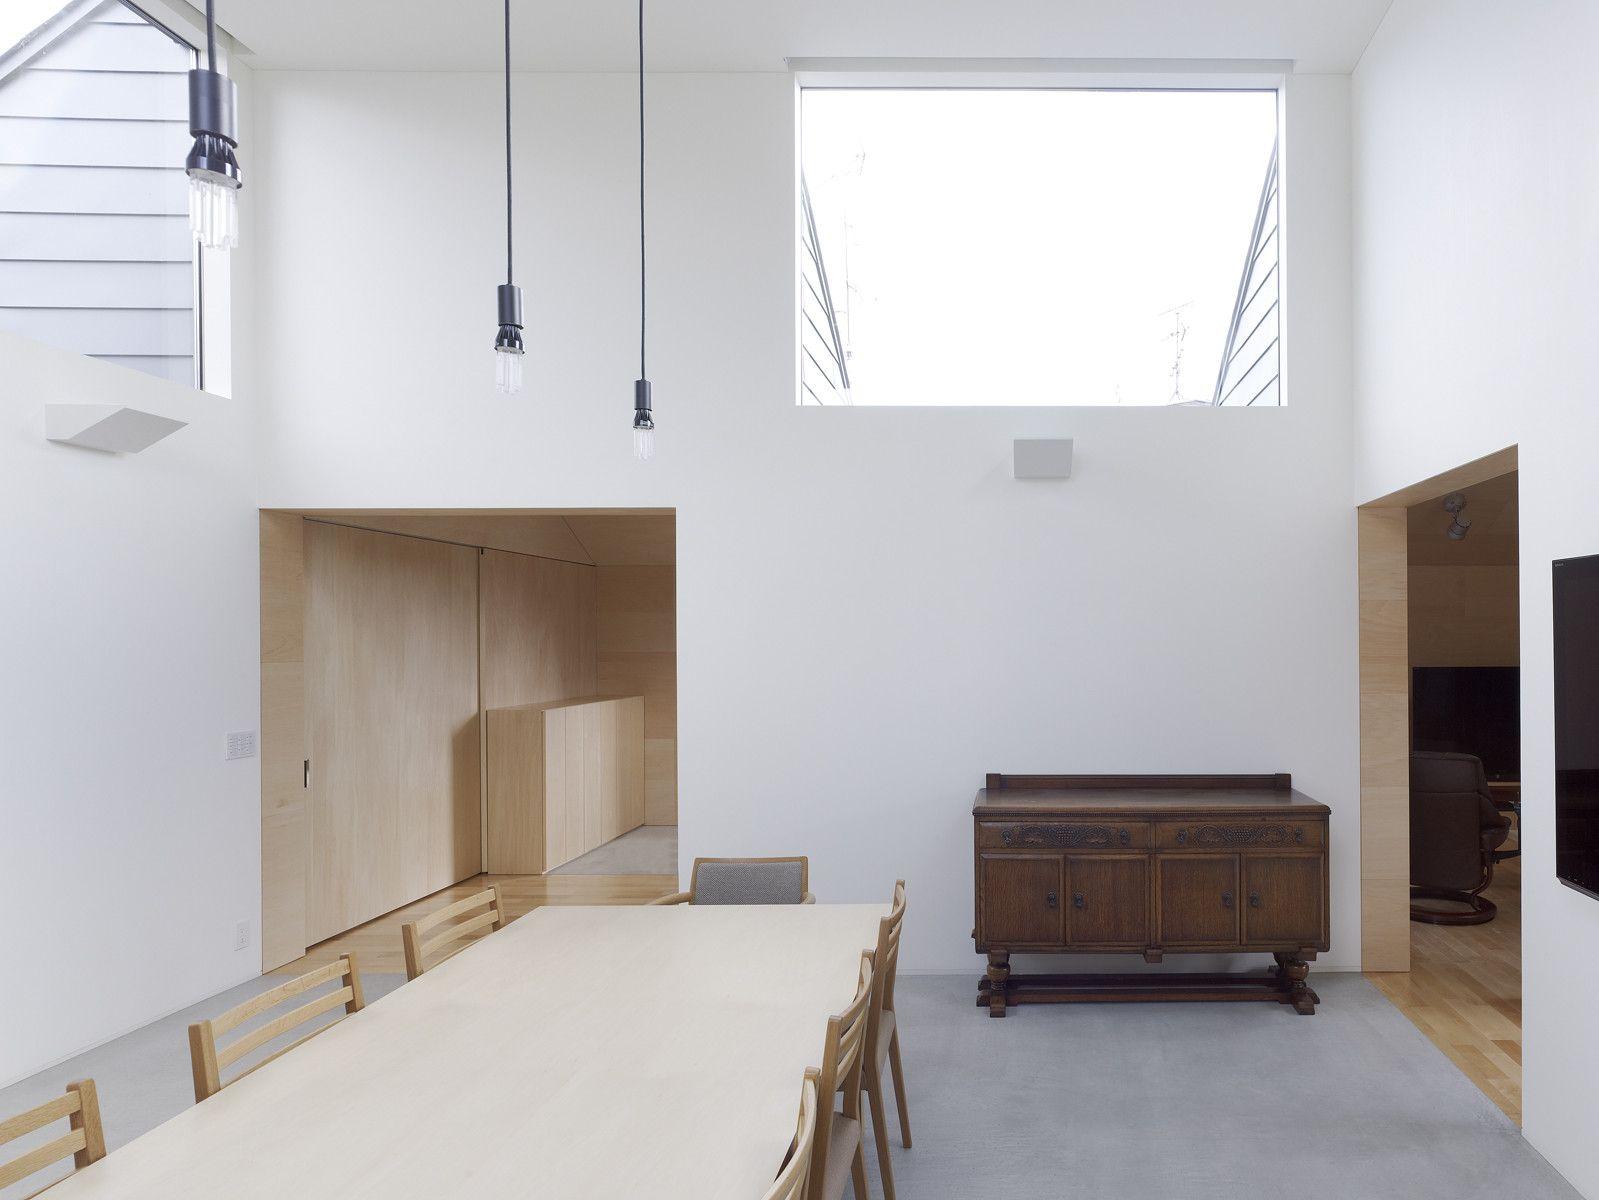 Gallery - House Yagiyama / Kazuya Saito Architects - 4